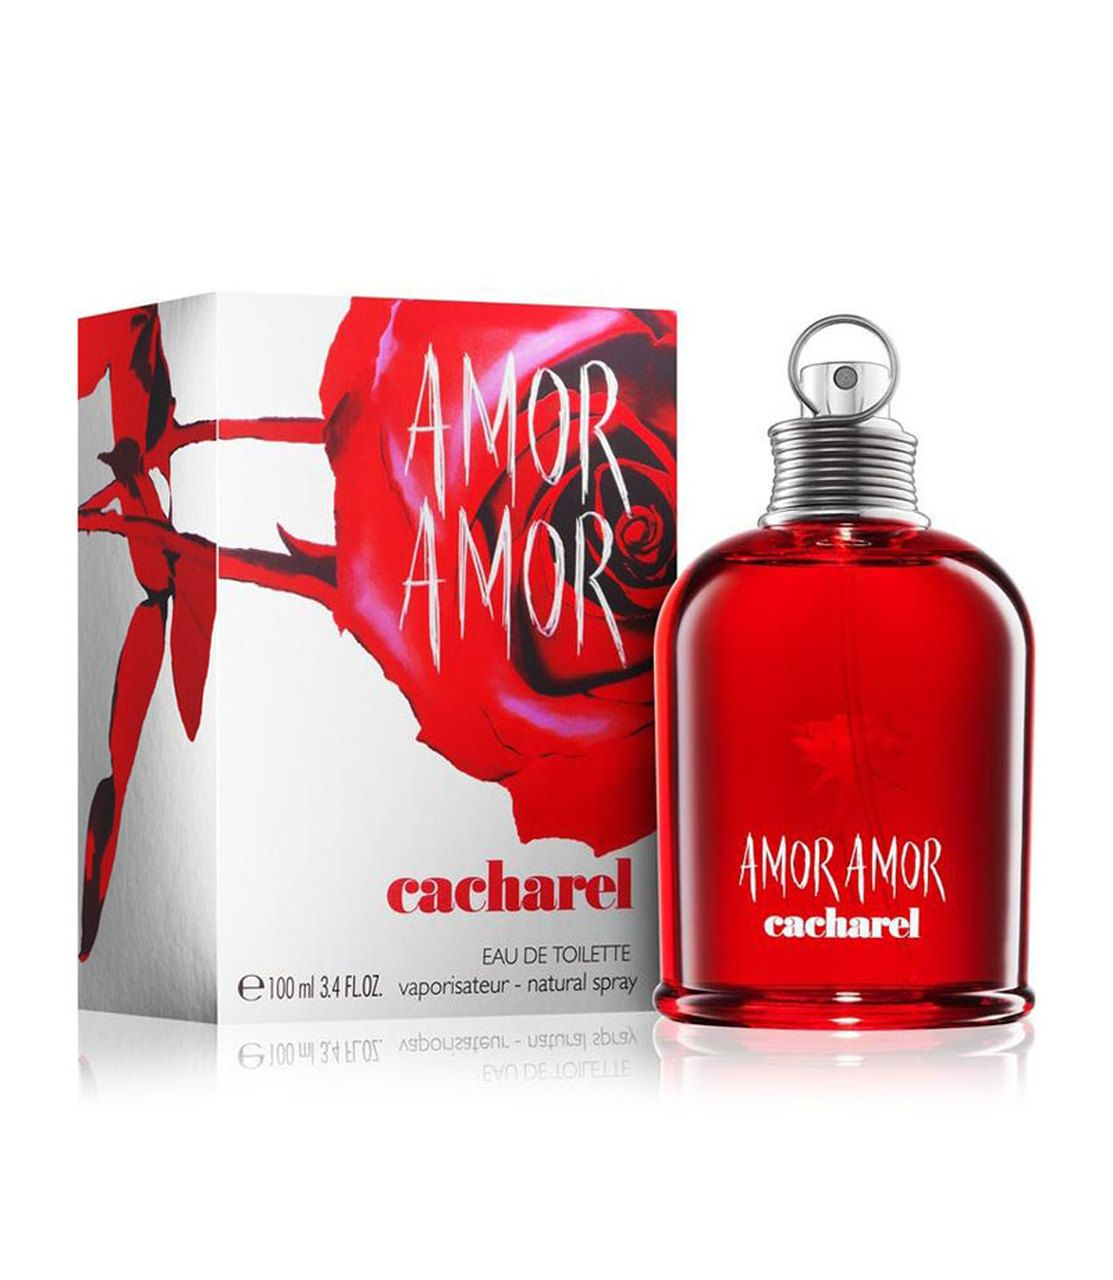 Cacharel Amor Amor Eau De Toilette Spray 3 4 Oz Cacharel Amor